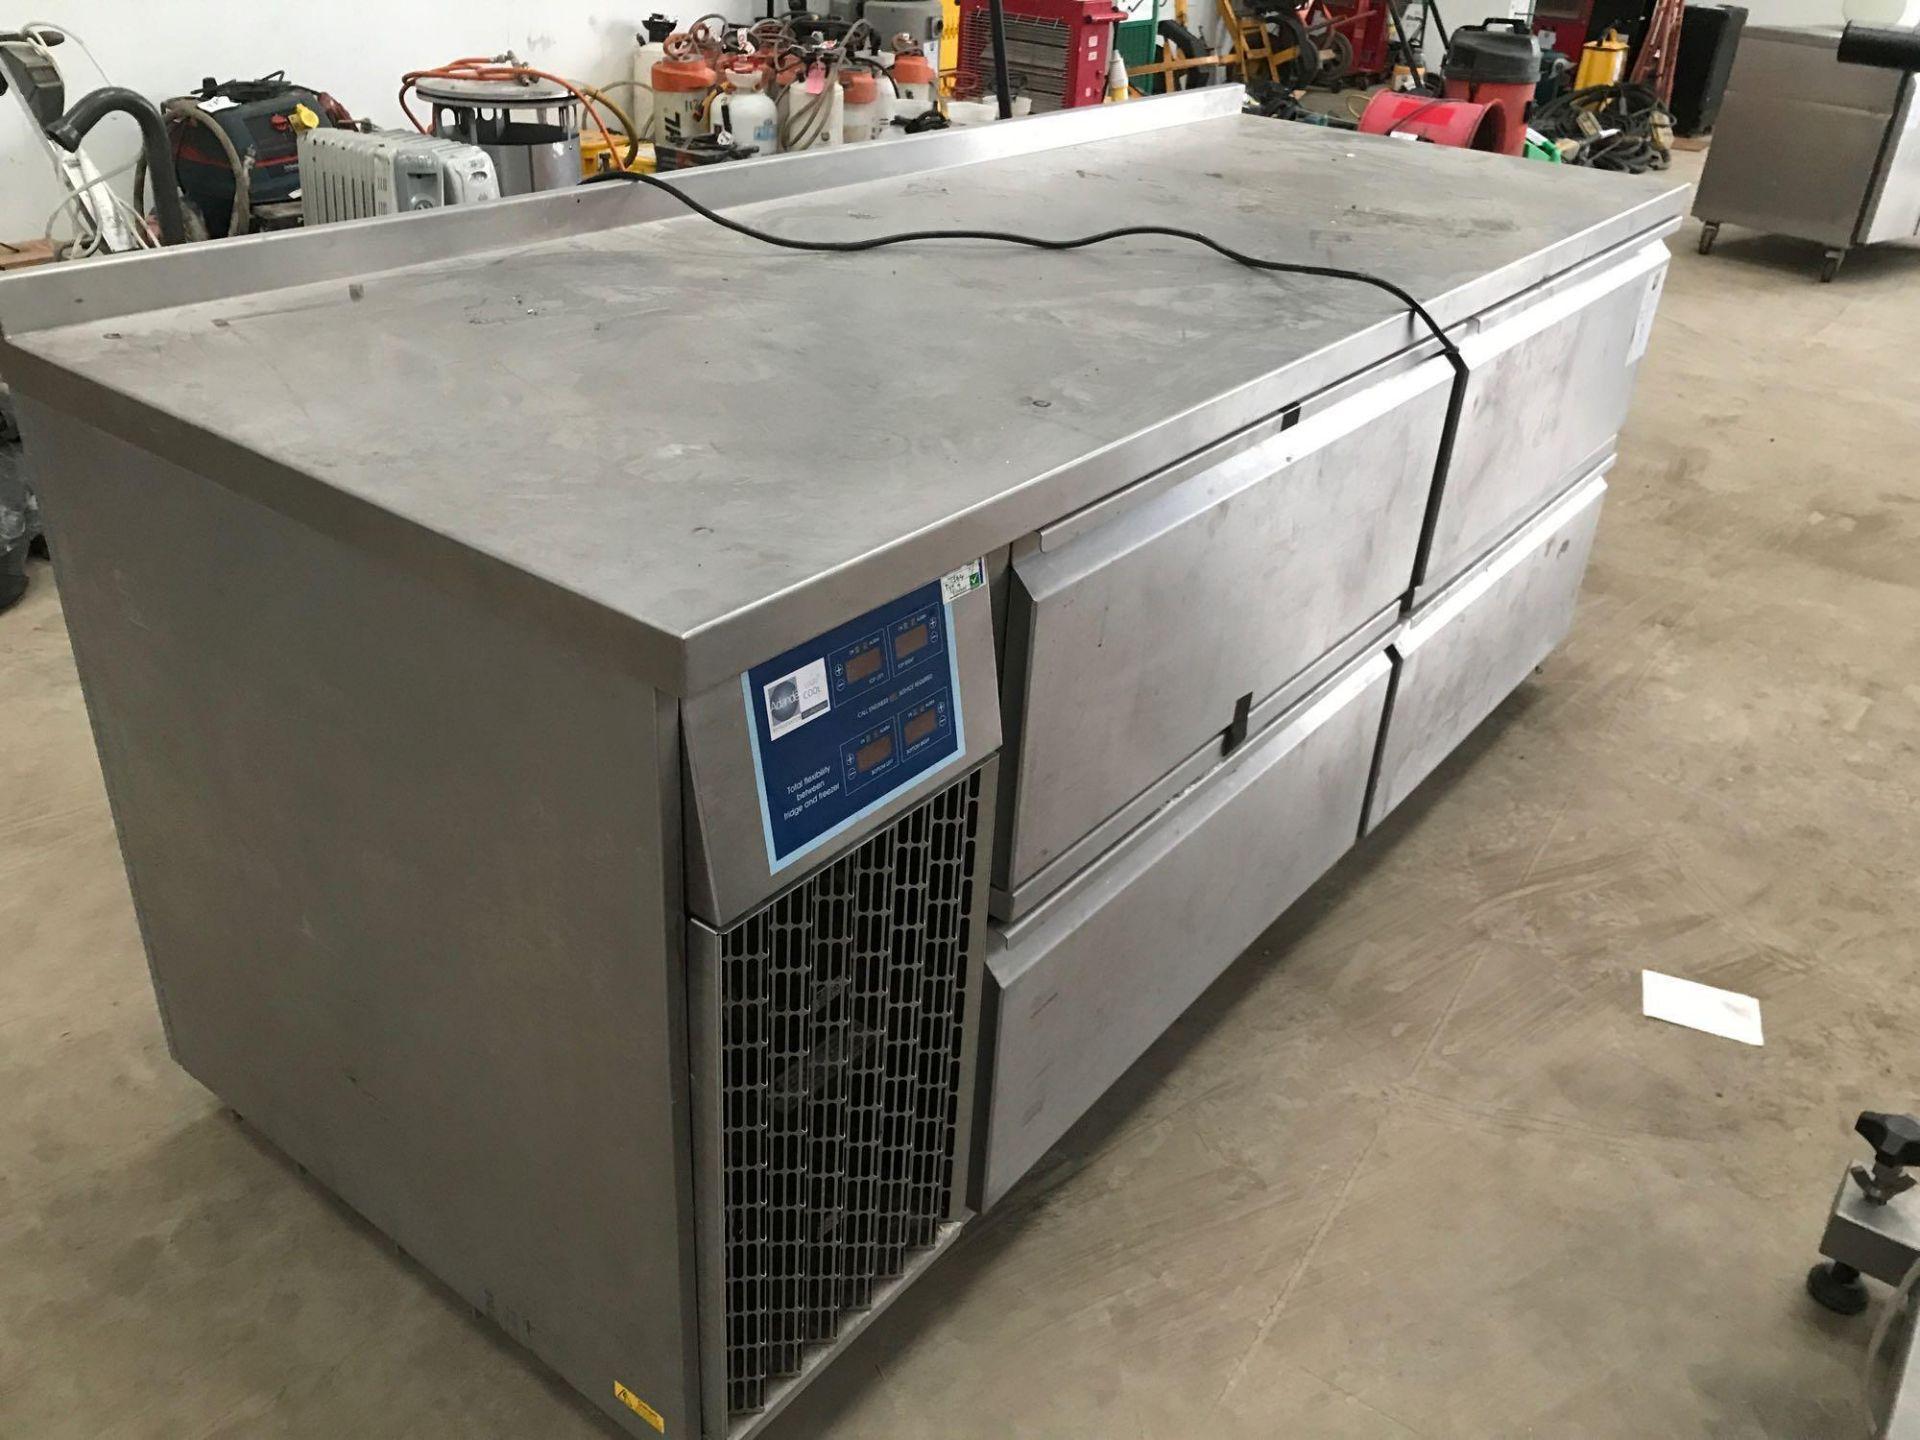 Lot 174 - Adande varicool830 TEV 4 draw refrigerator / freezer